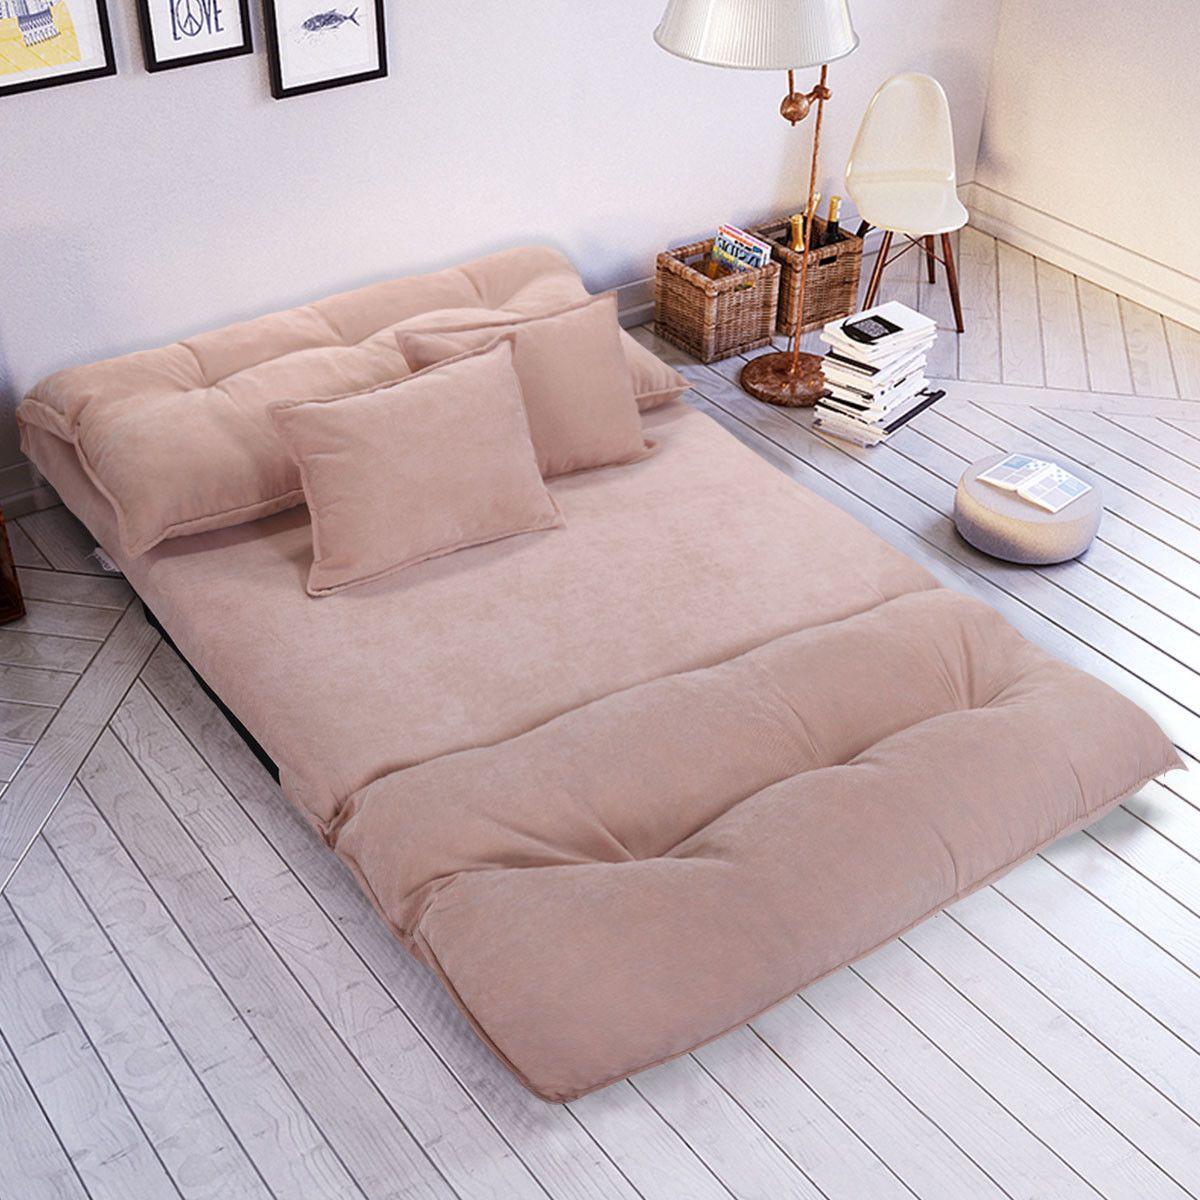 98 49 New Adjustable Floor Sofa Bed Lounge Sofa Bed Floor Couch With Pillows Adjustable Lounge Pillows Di Sofa Bed Sale Floor Couch Modern Sofa Bed